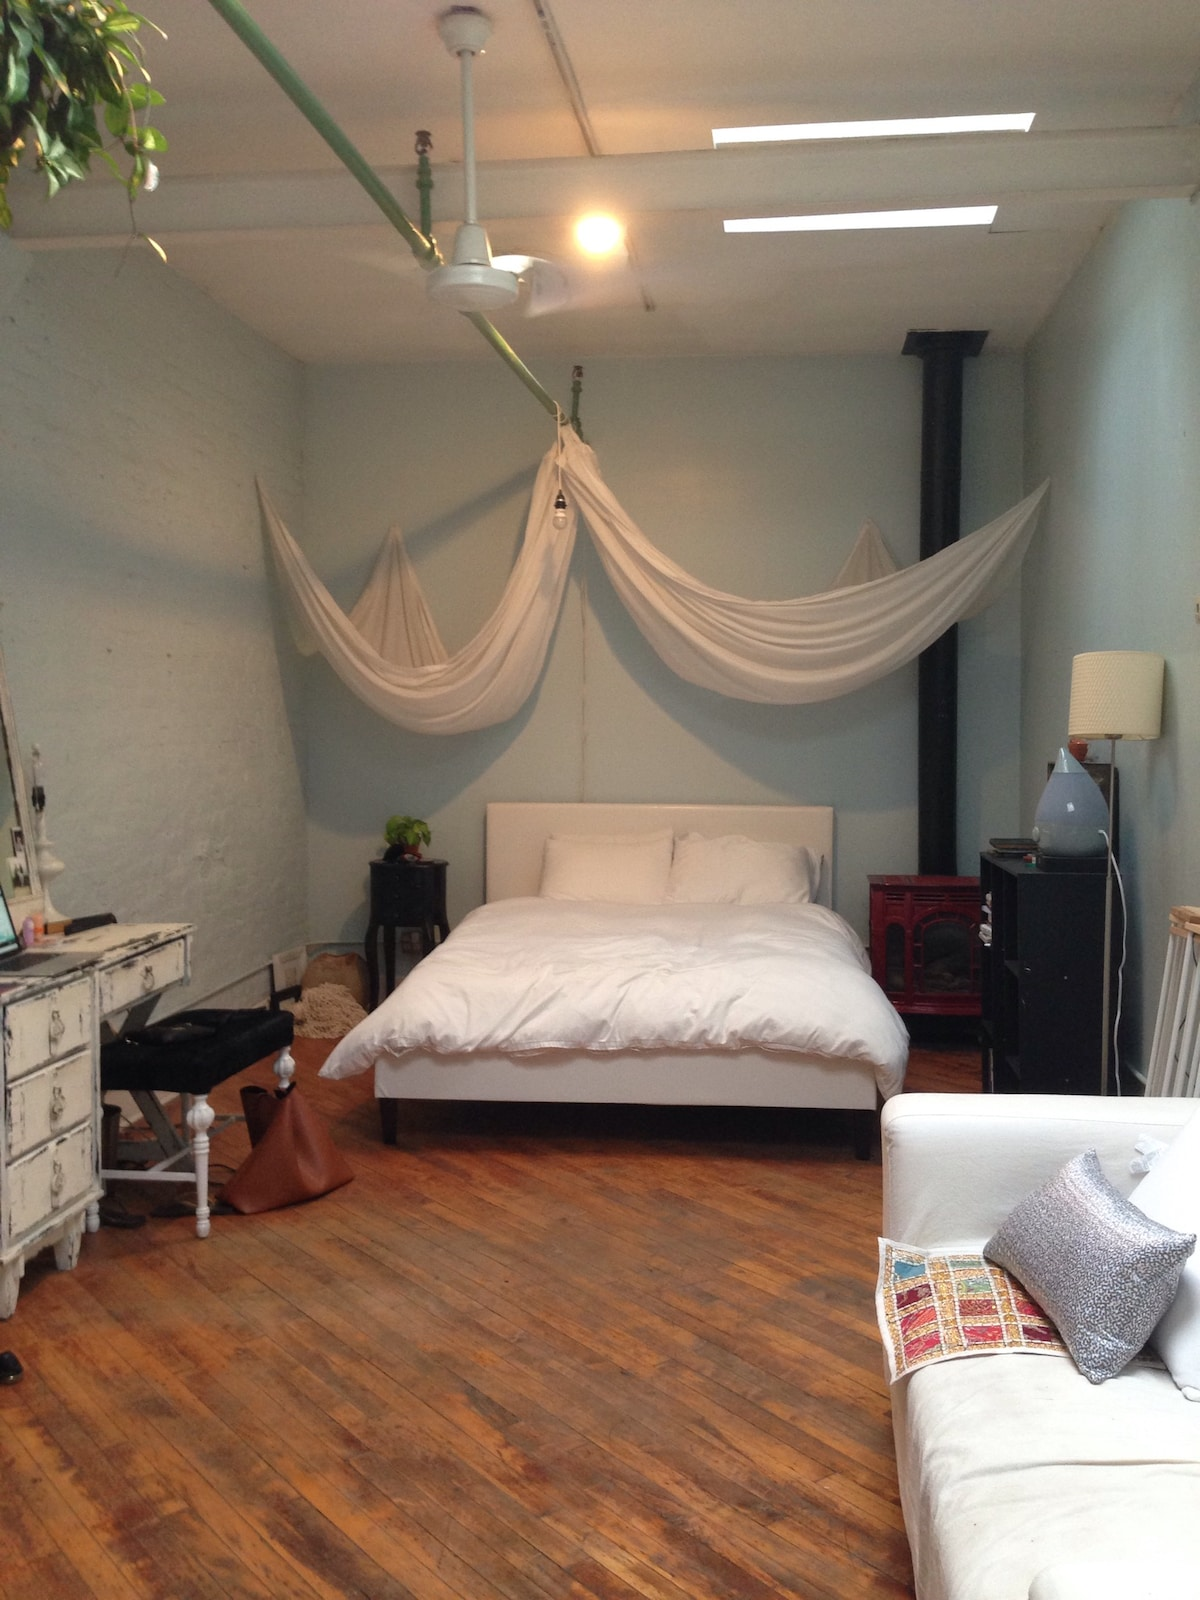 Huge loft room in Brooklyn